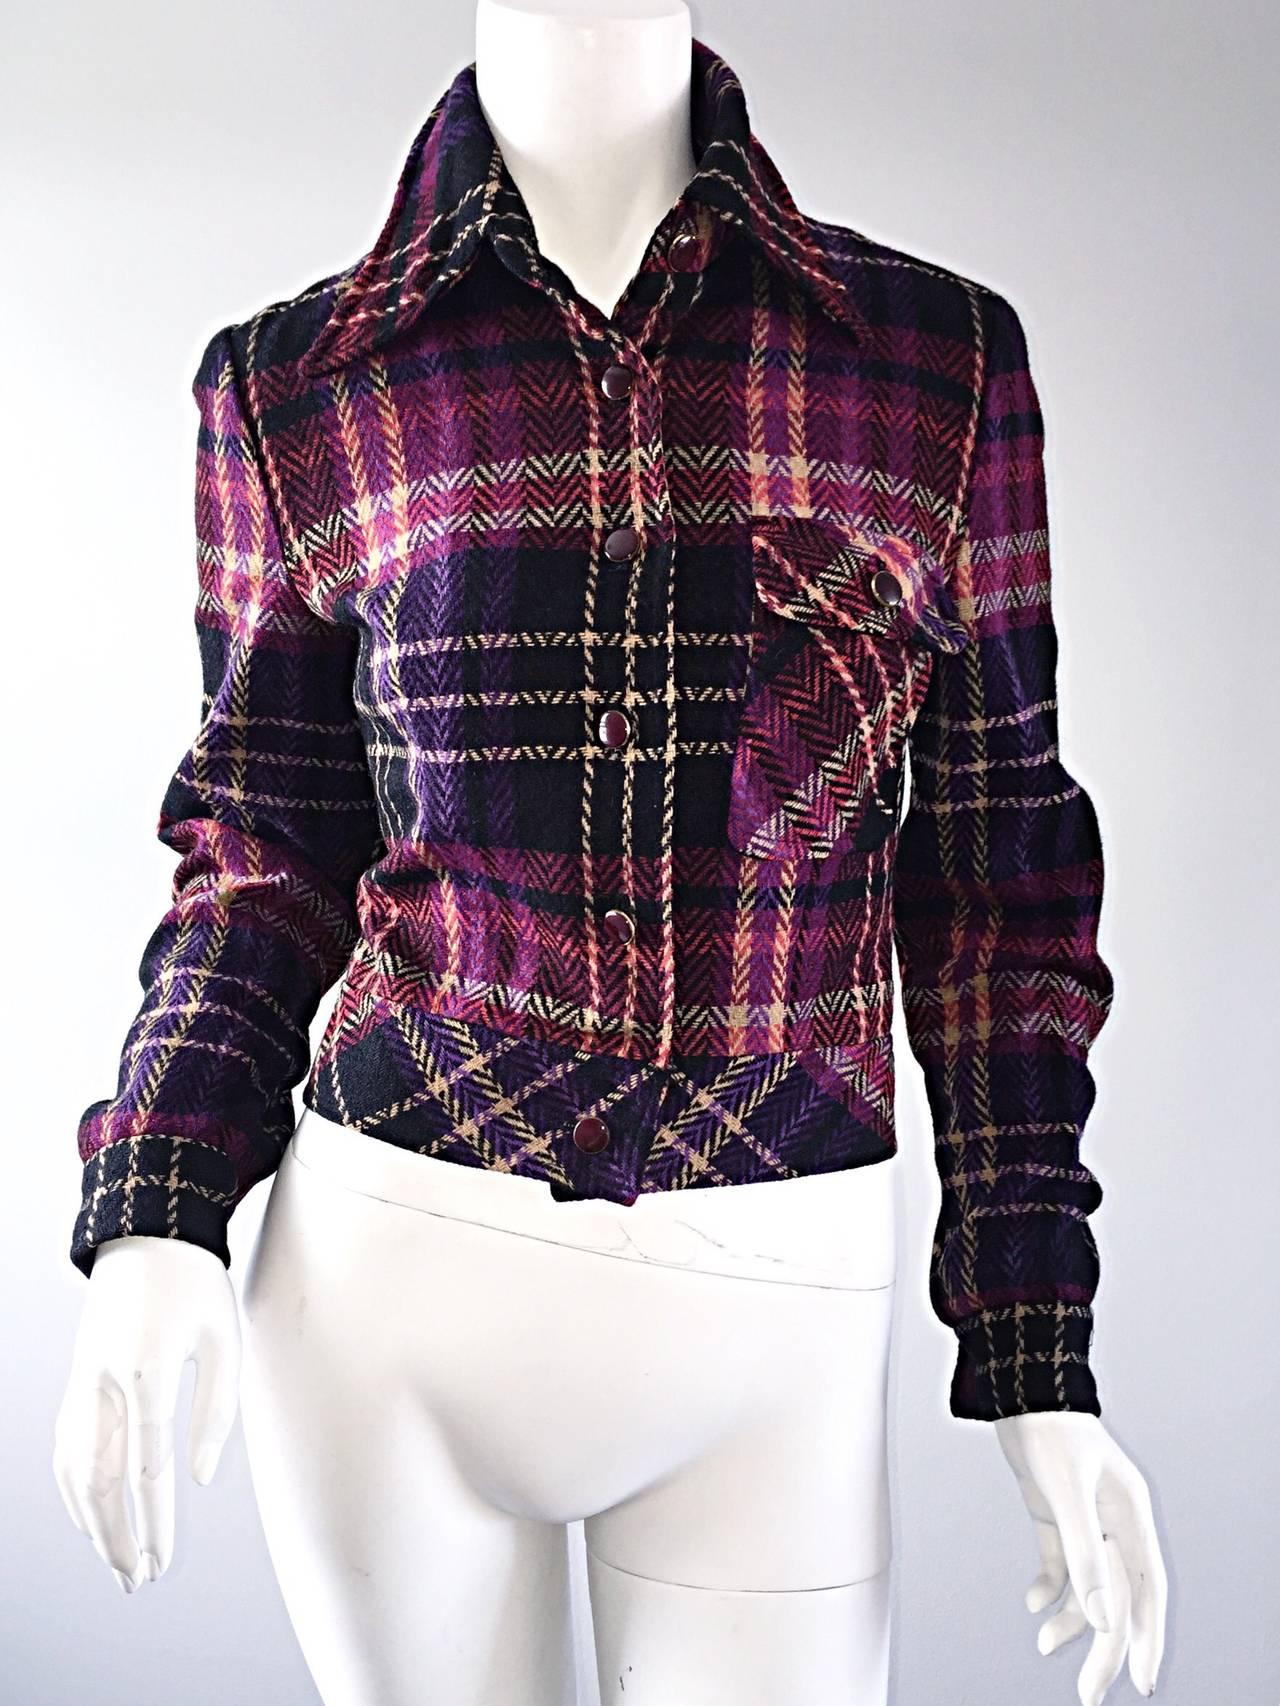 1970s Vintage Addena for I. Magnin Pink + Purple Plaid Herringbone Wool Jacket 8